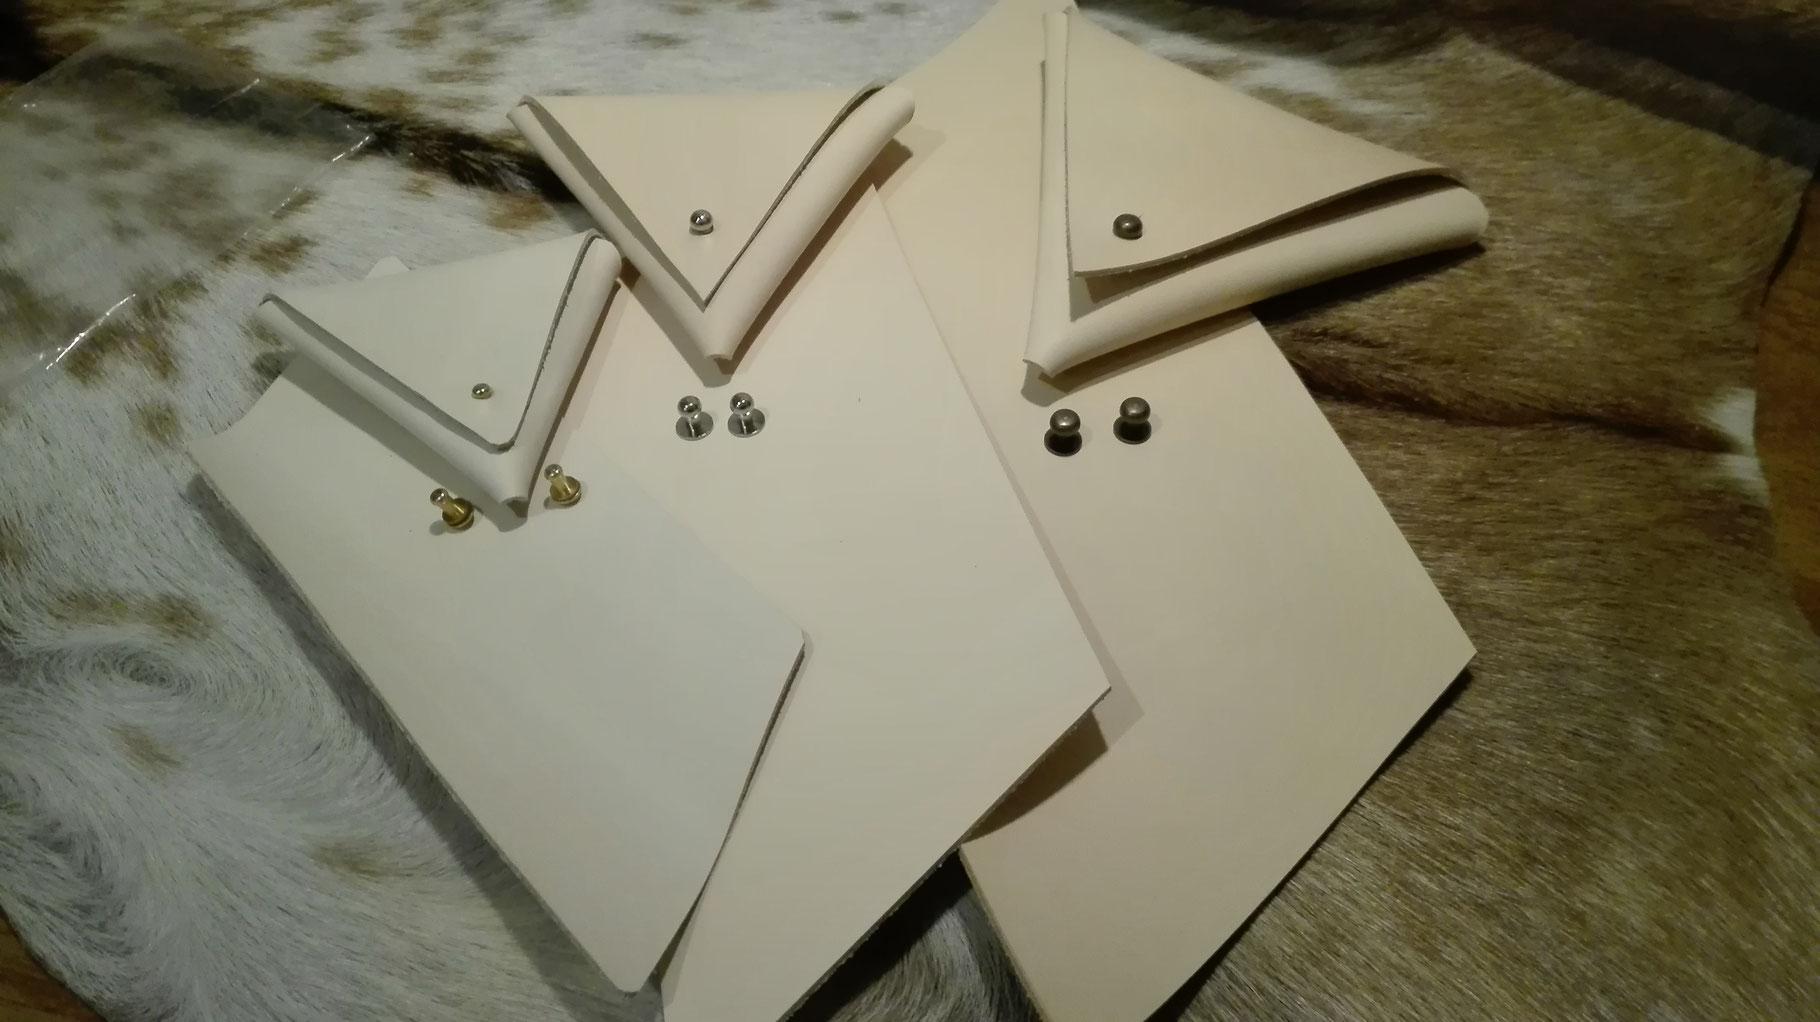 minib rse blankleder vegetable olas lederthek lederg rtel hundehalsb nder lederarmband. Black Bedroom Furniture Sets. Home Design Ideas